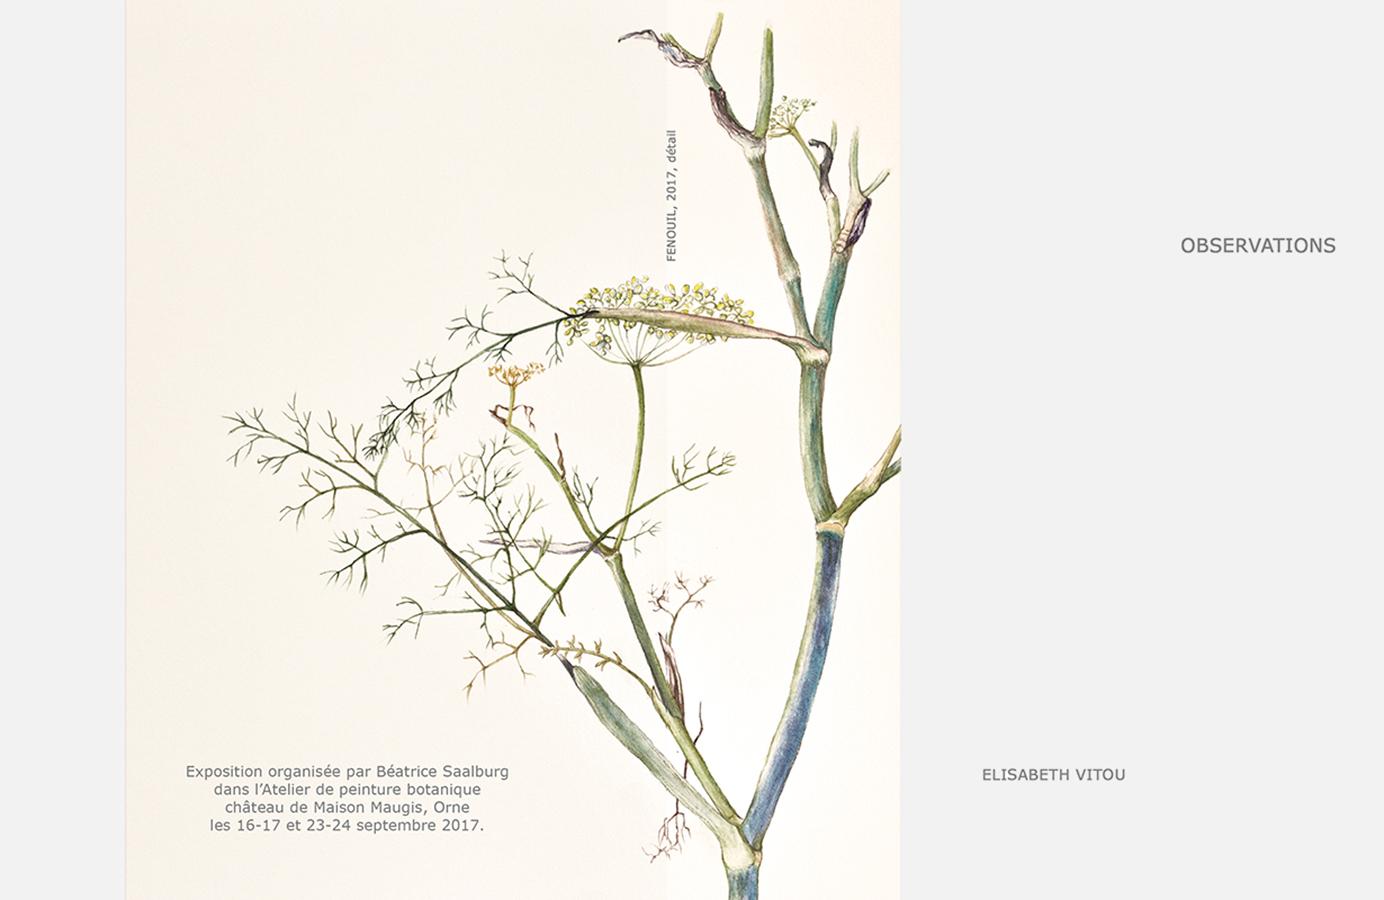 elisabeth vitou-artiste botanique-tige botanique-peinture botanique-illustration botanique paris